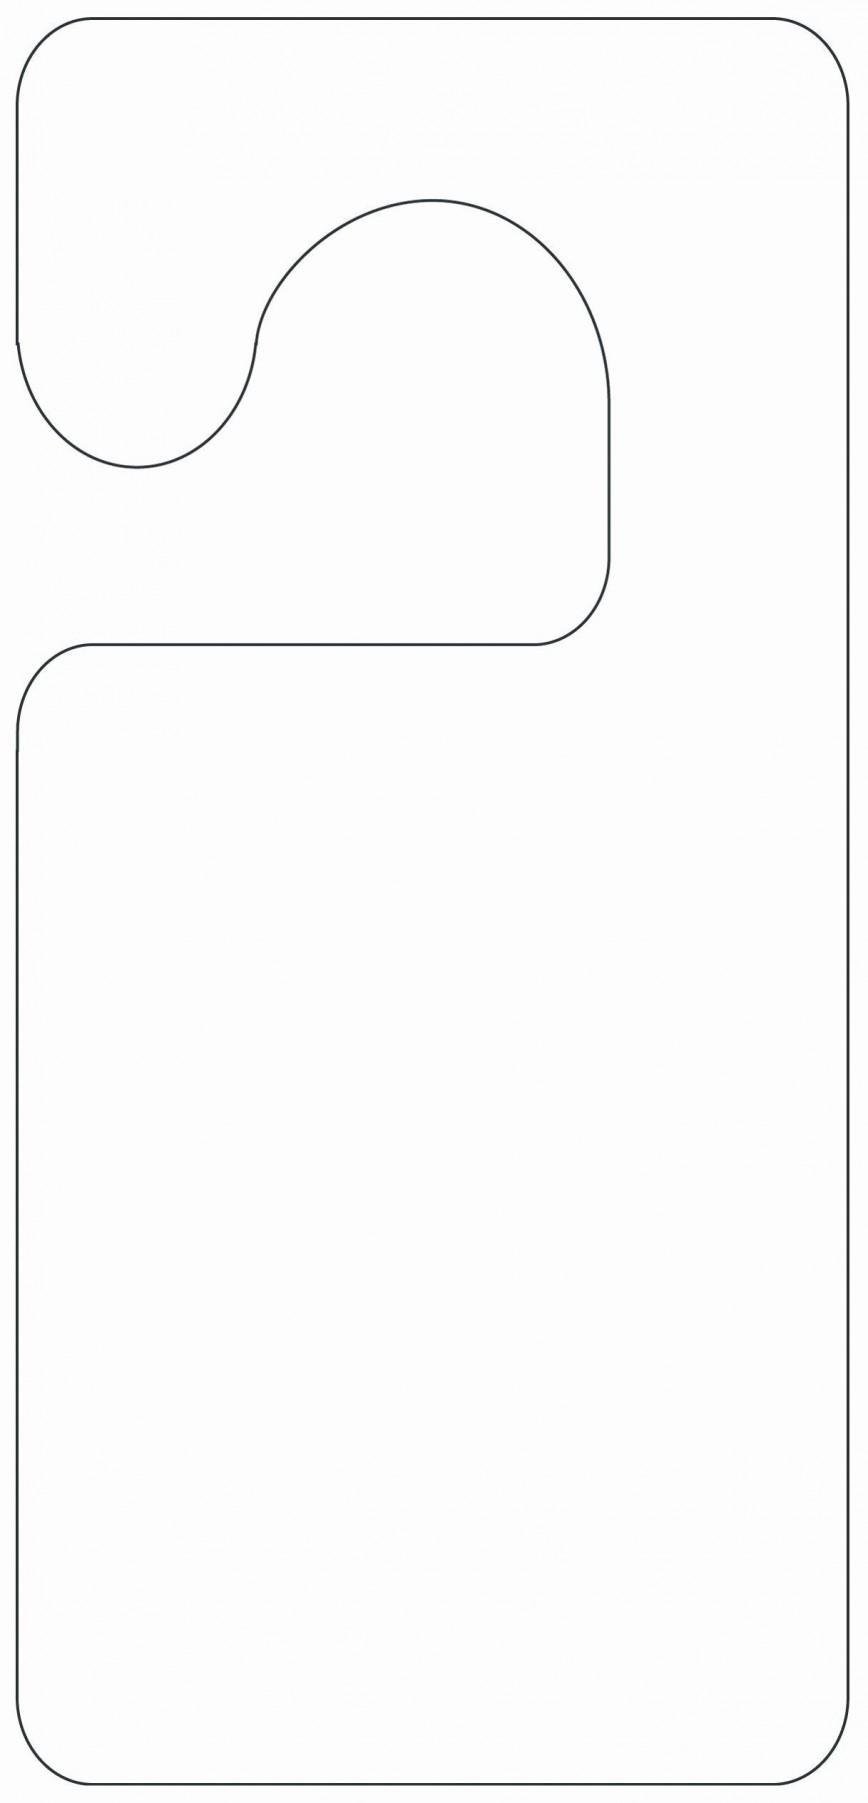 002 Wondrou Free Printable Template For Door Hanger Sample 868